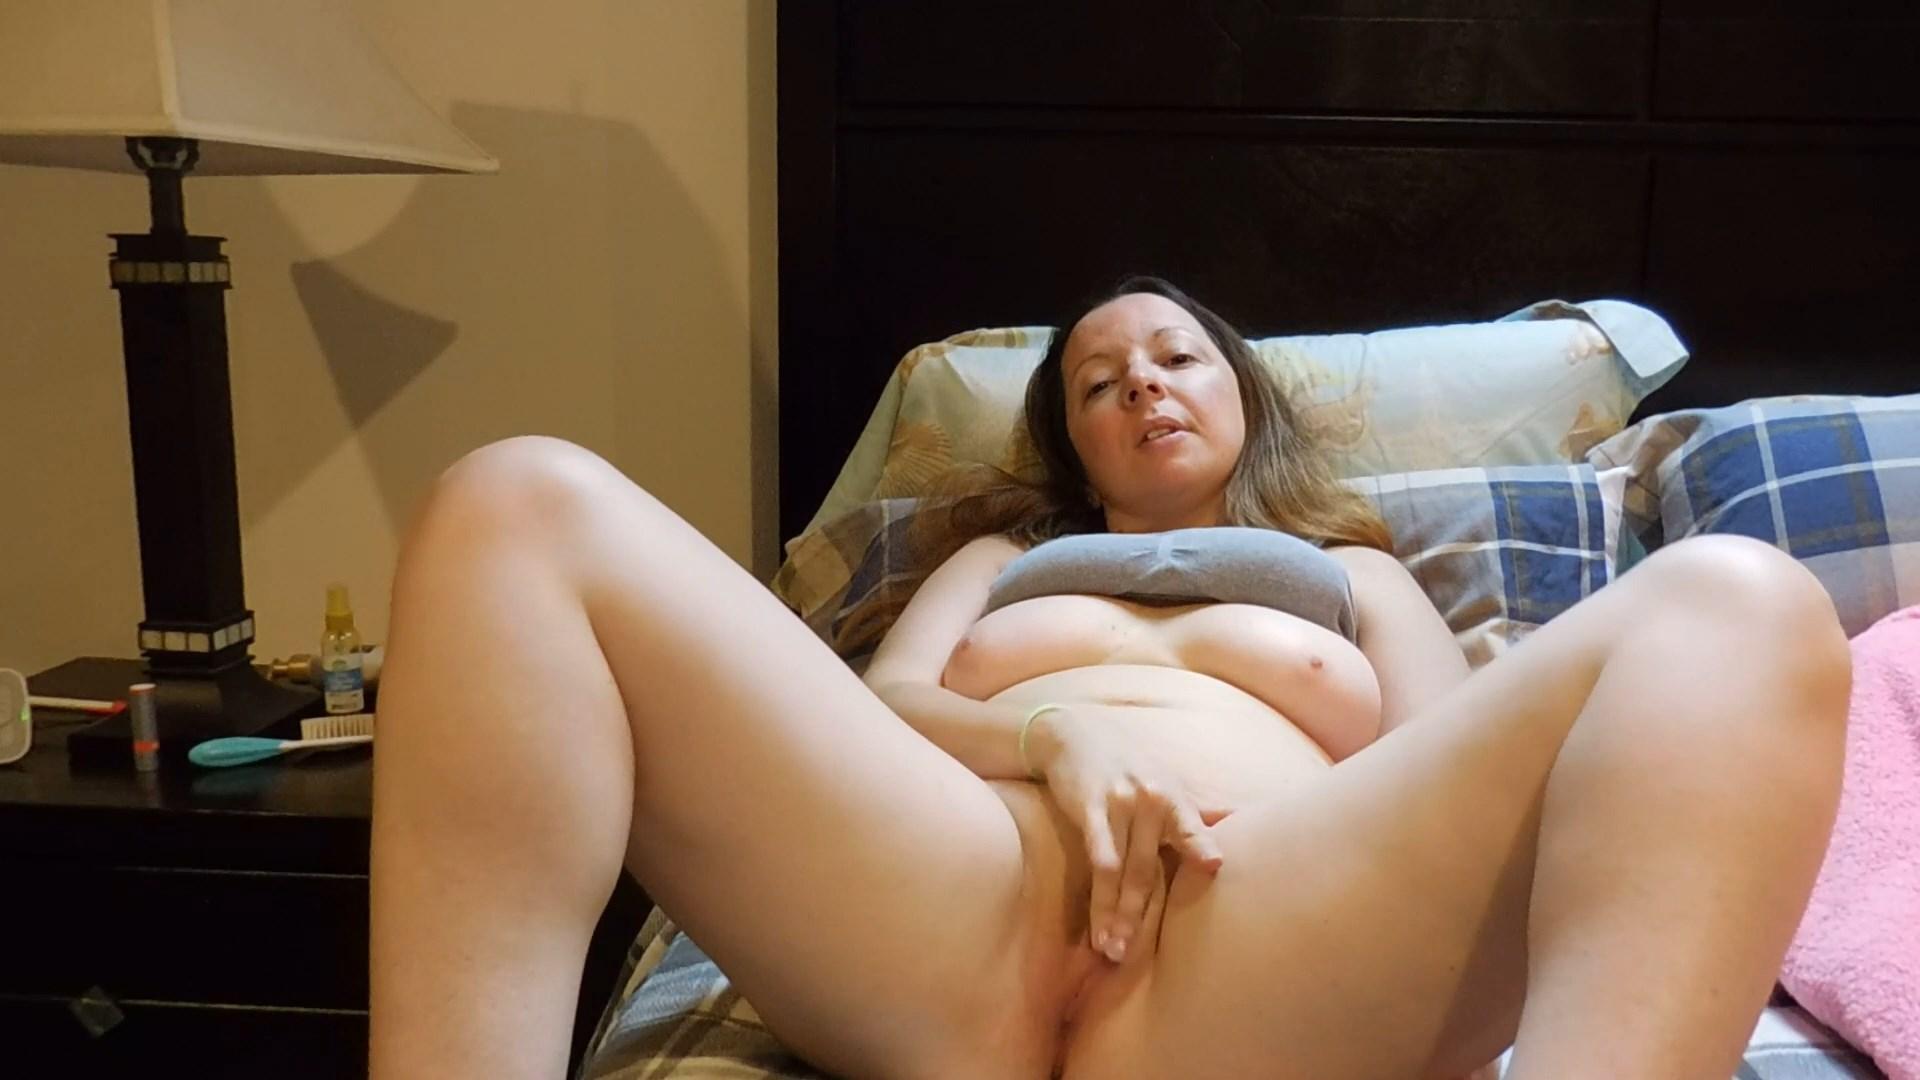 Melanie Sweets - Naughty homewrecker MILF next door